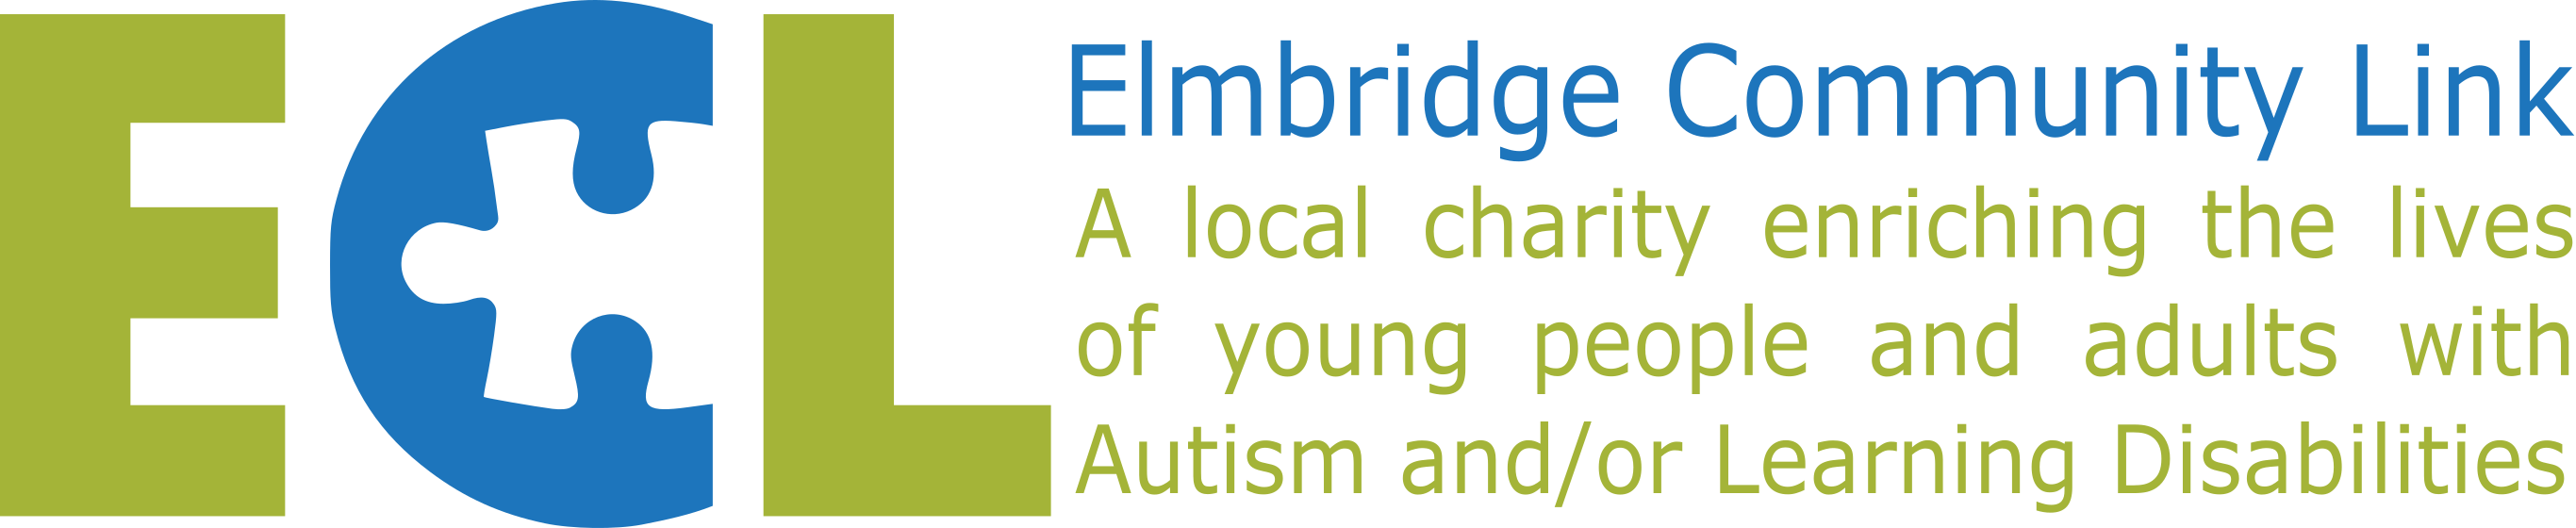 Elmbridge Community Link